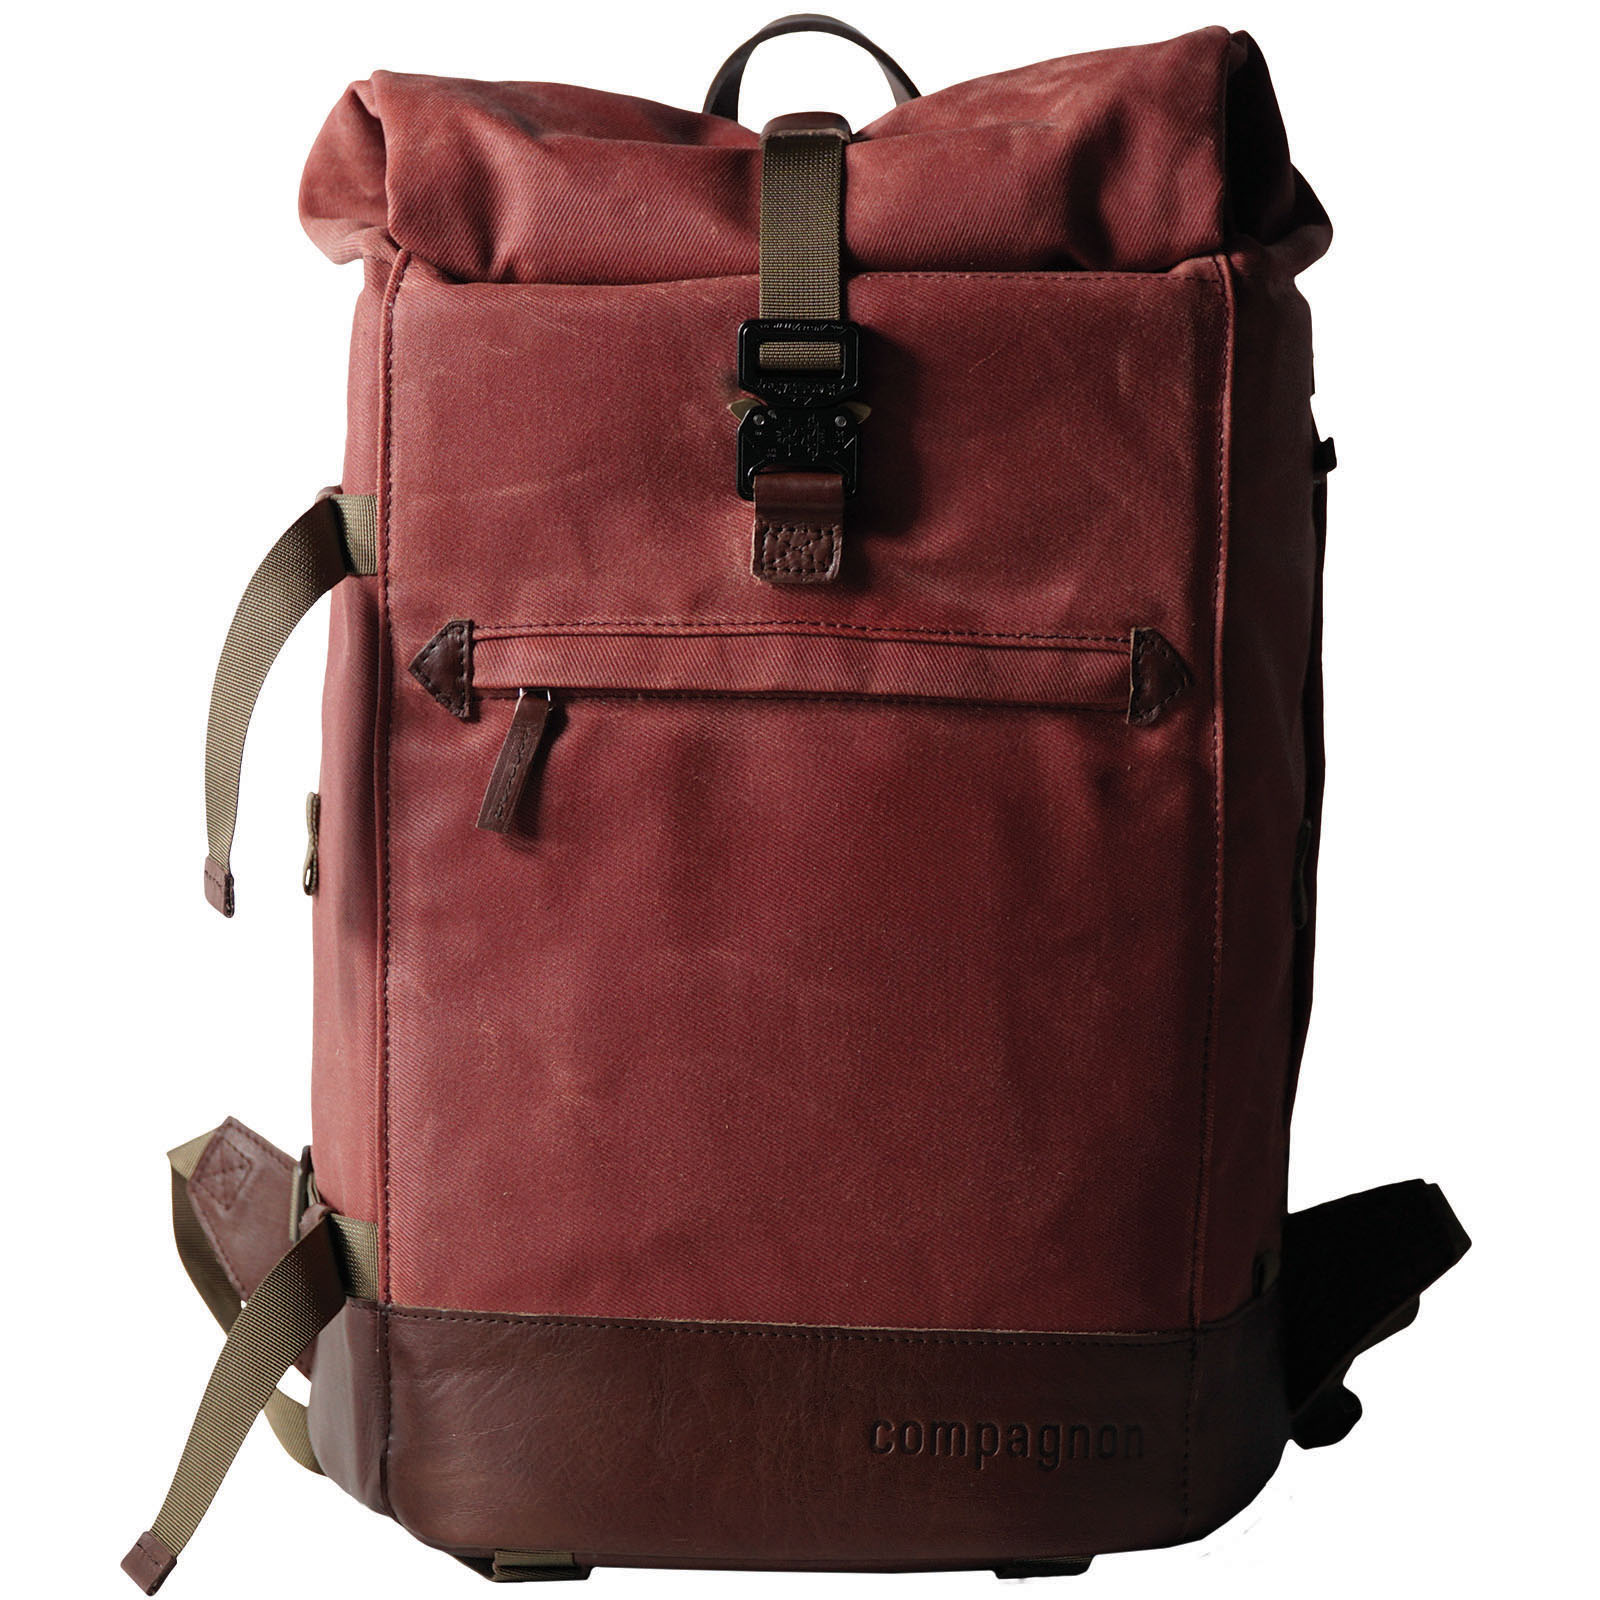 New Womens DSLR Camera Bag | EBay